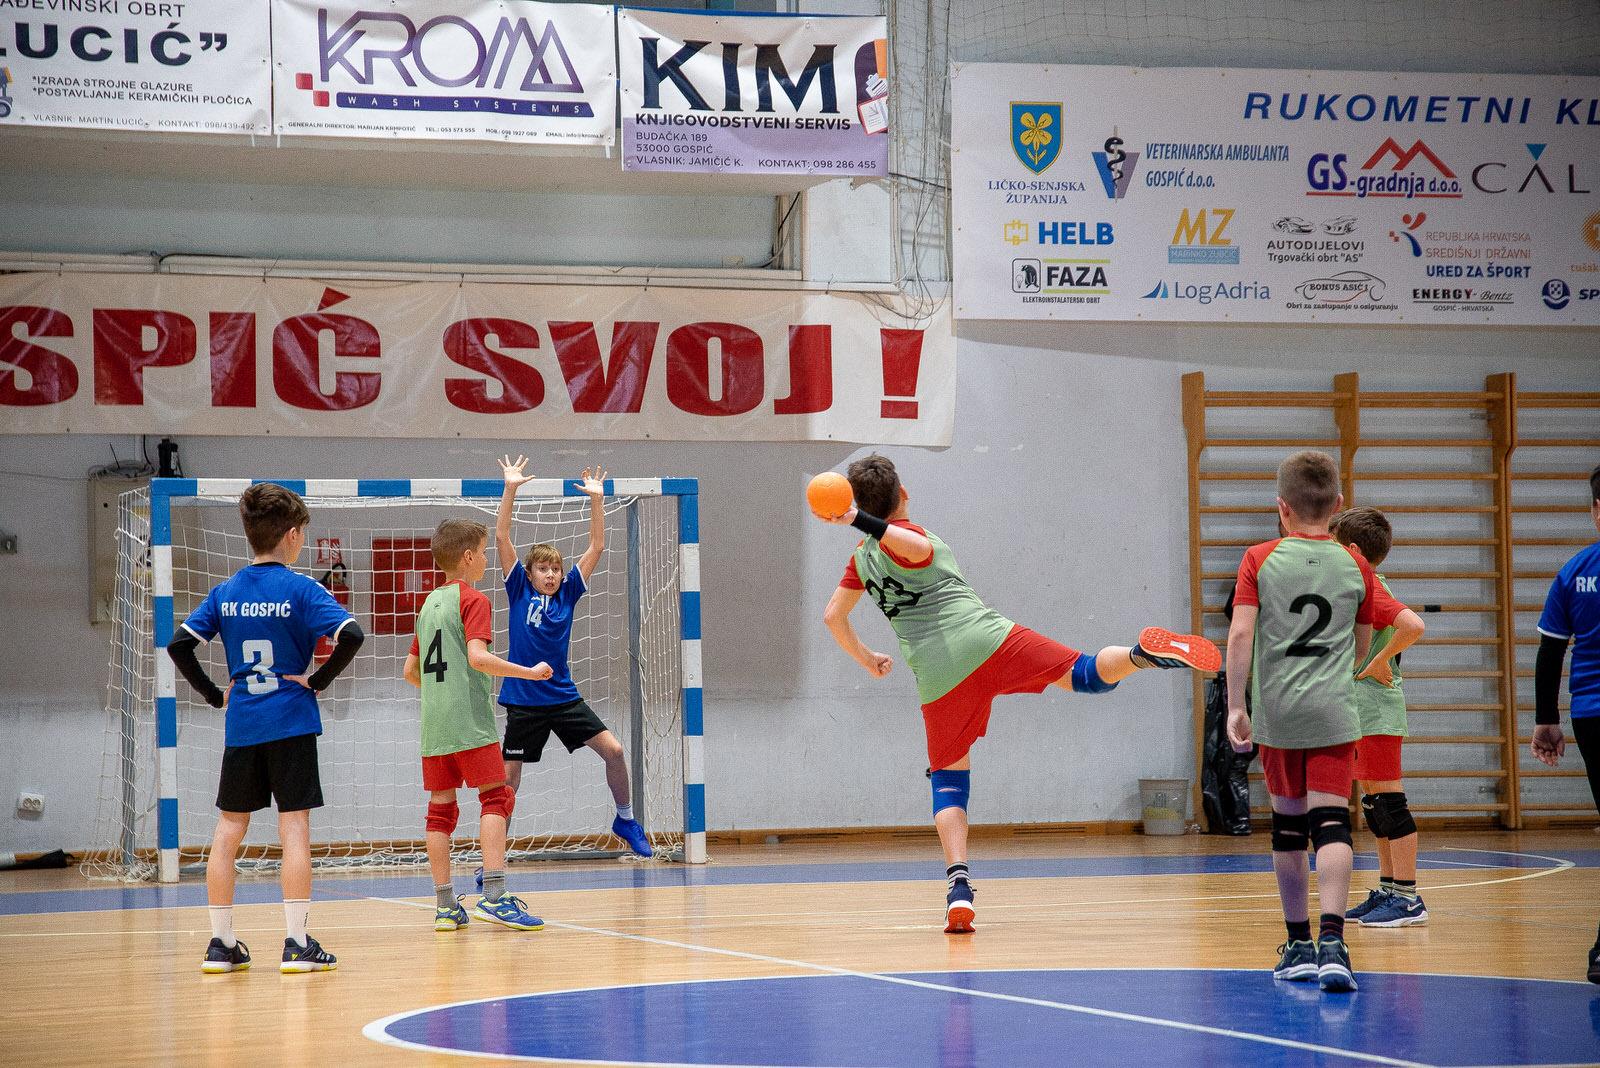 likaclub_rk gospić_turnir mali medo_2020 (34)